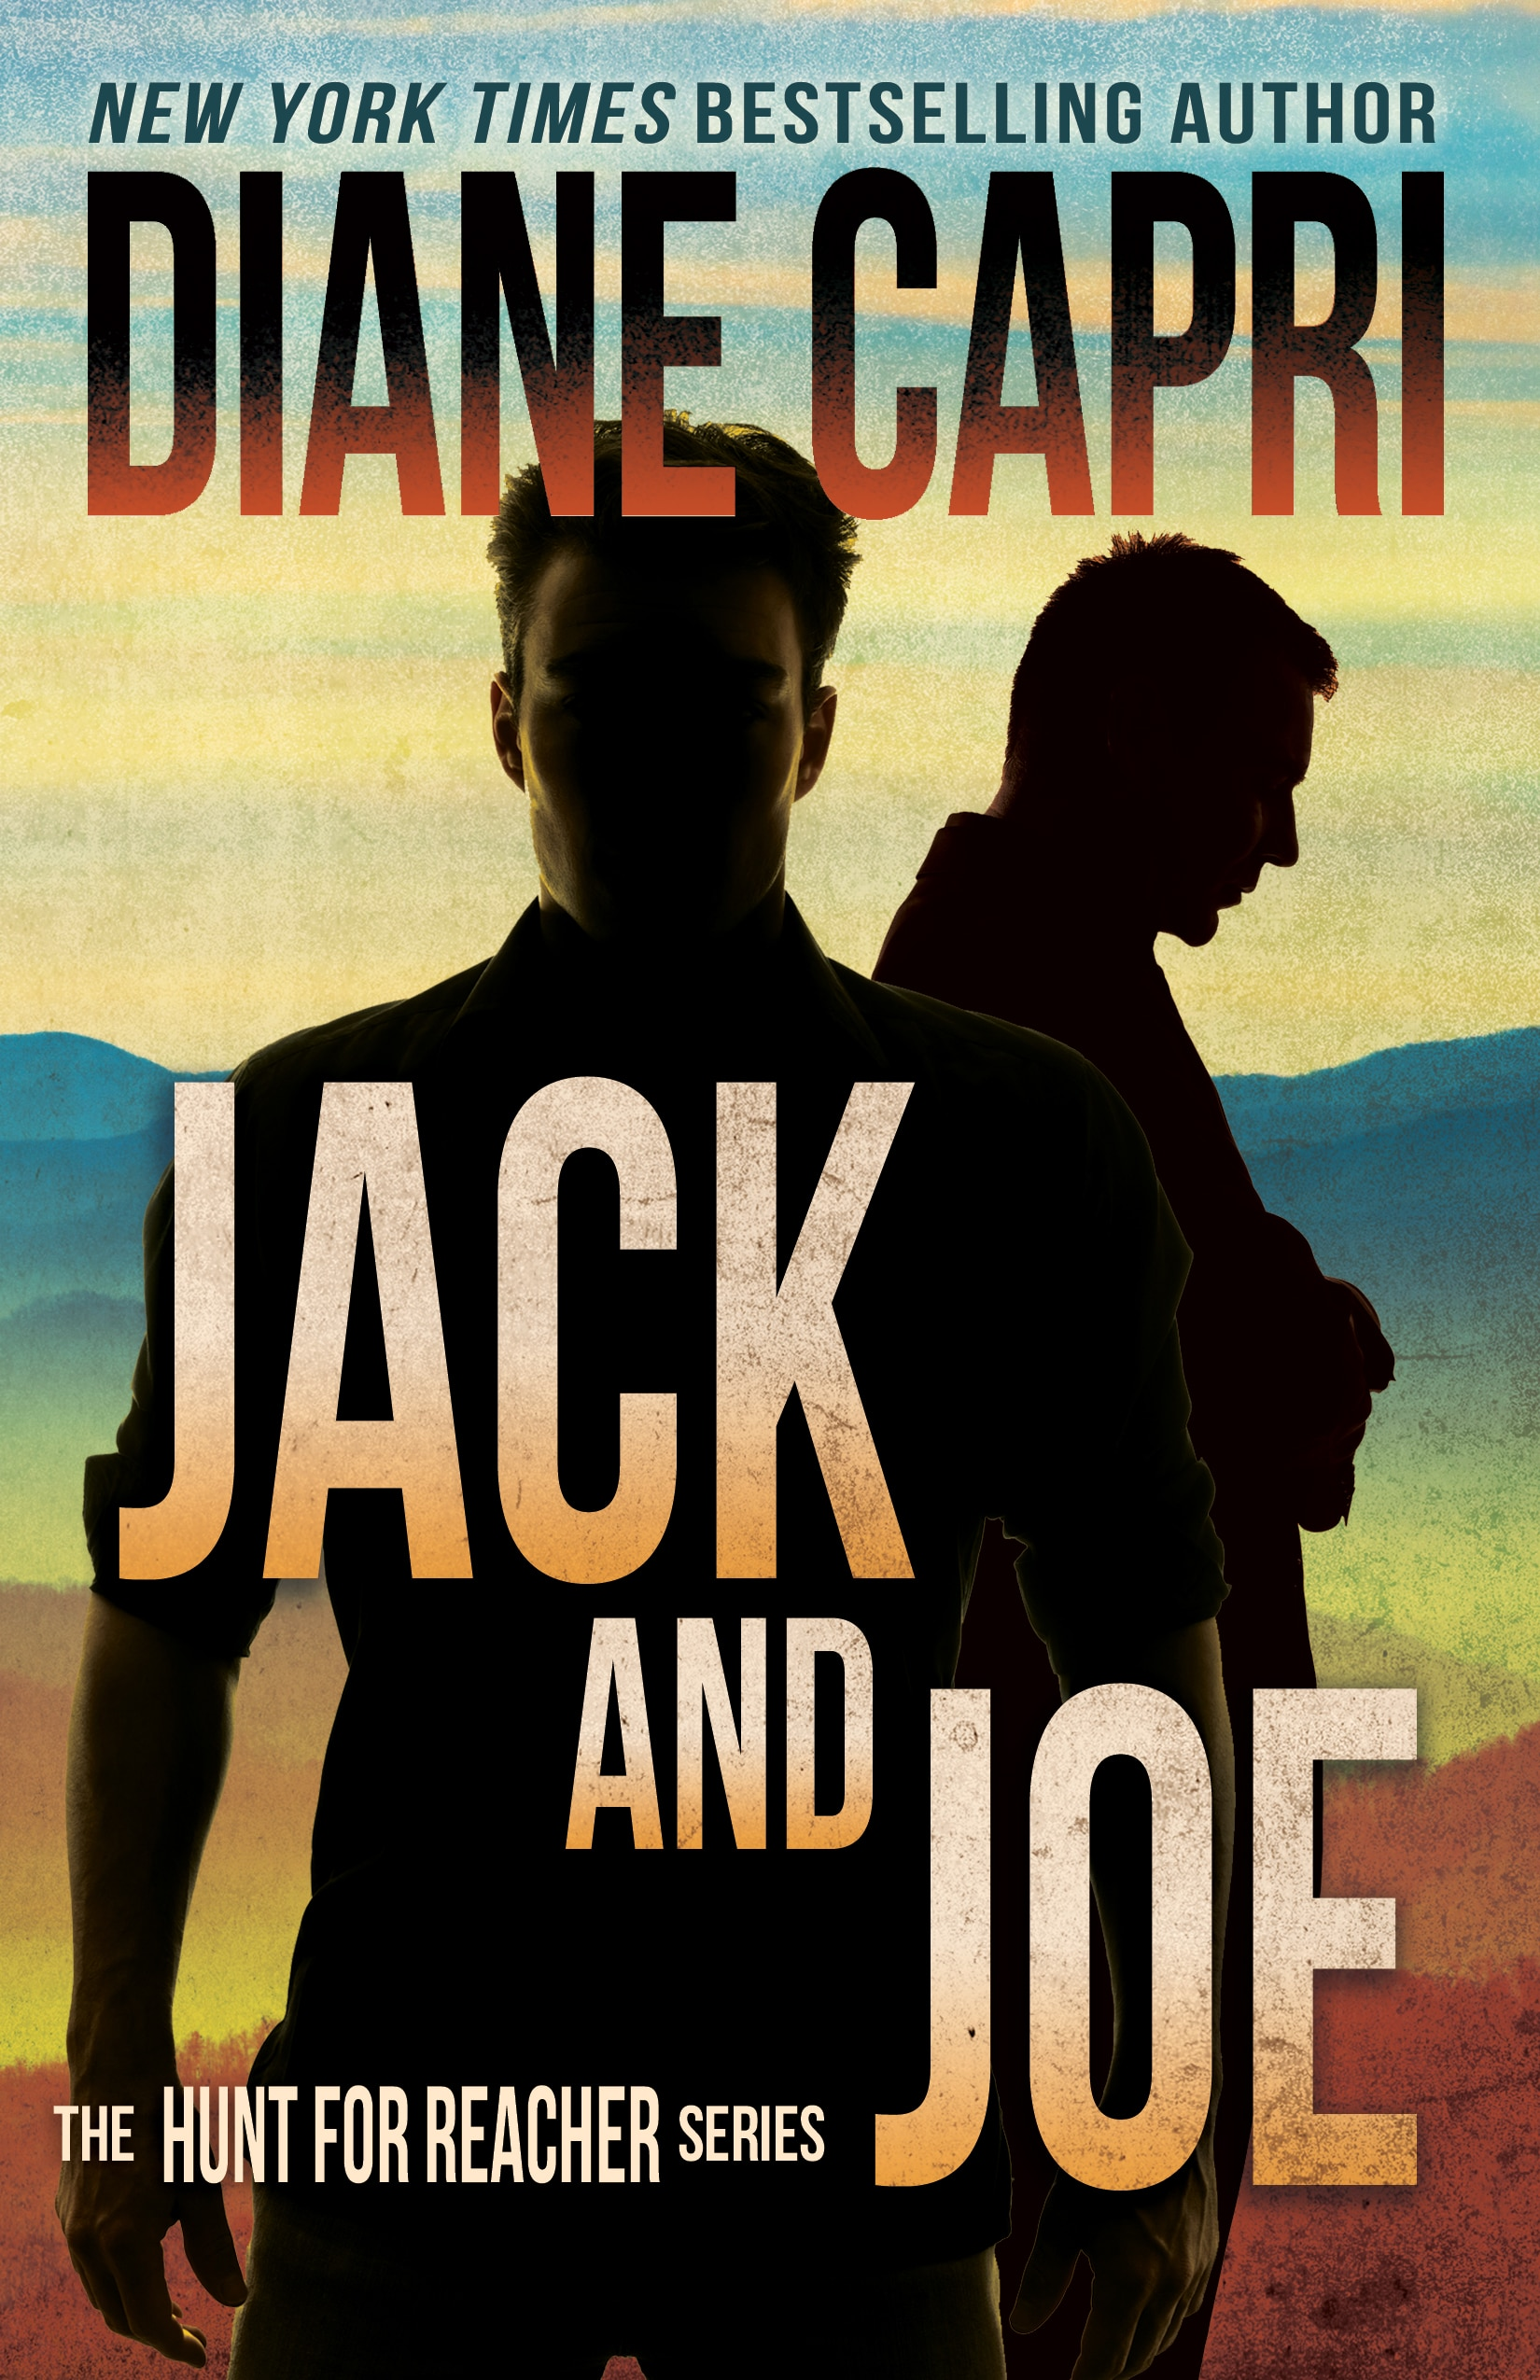 Jack and Joe Reacher